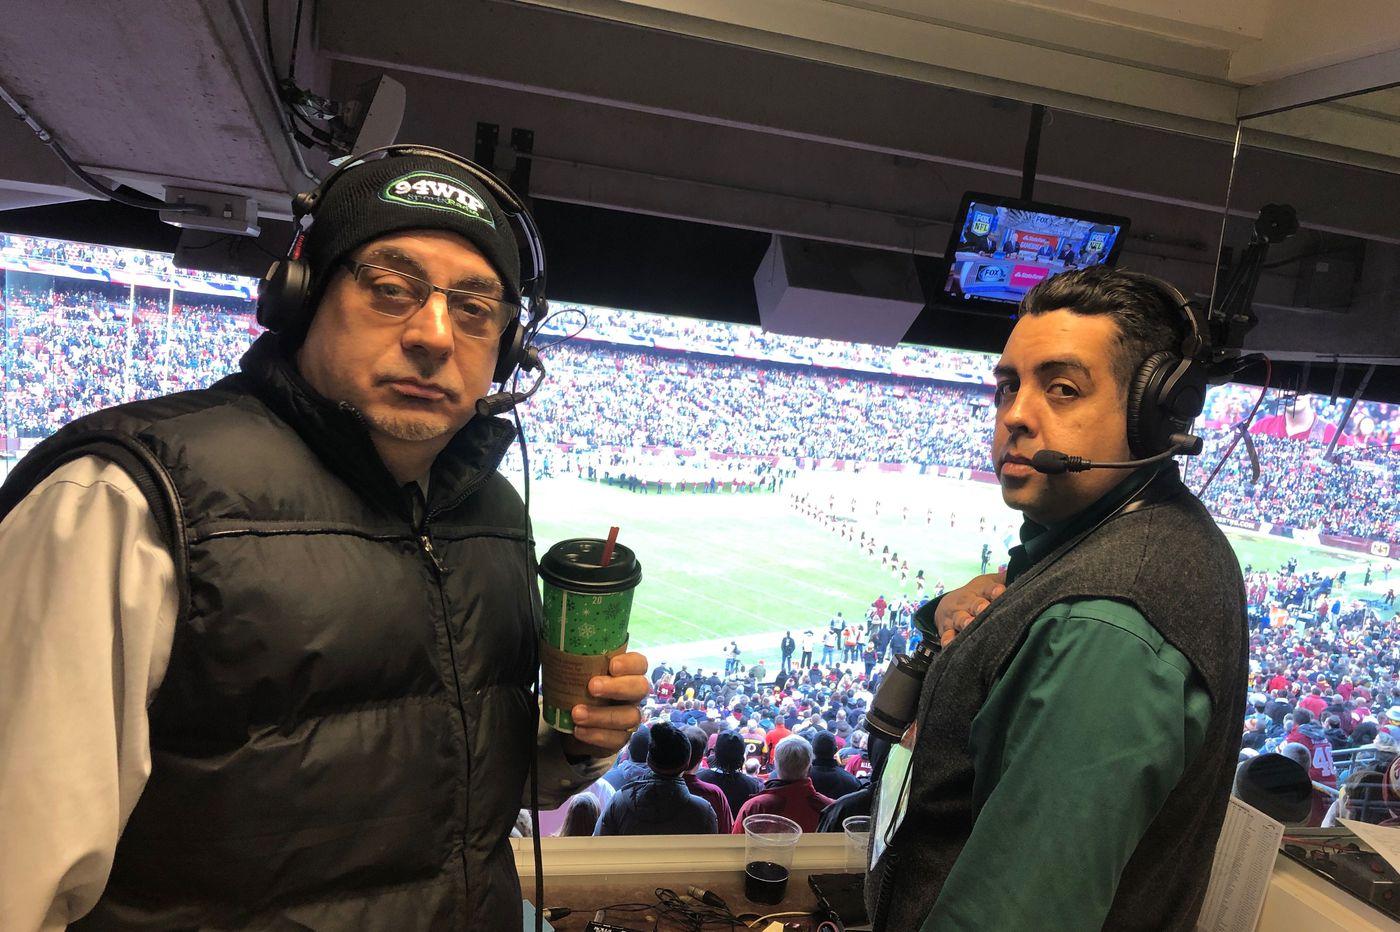 Where did announcer Rickie Ricardo get his '¡No, señor!' call for Sunday's Eagles win?